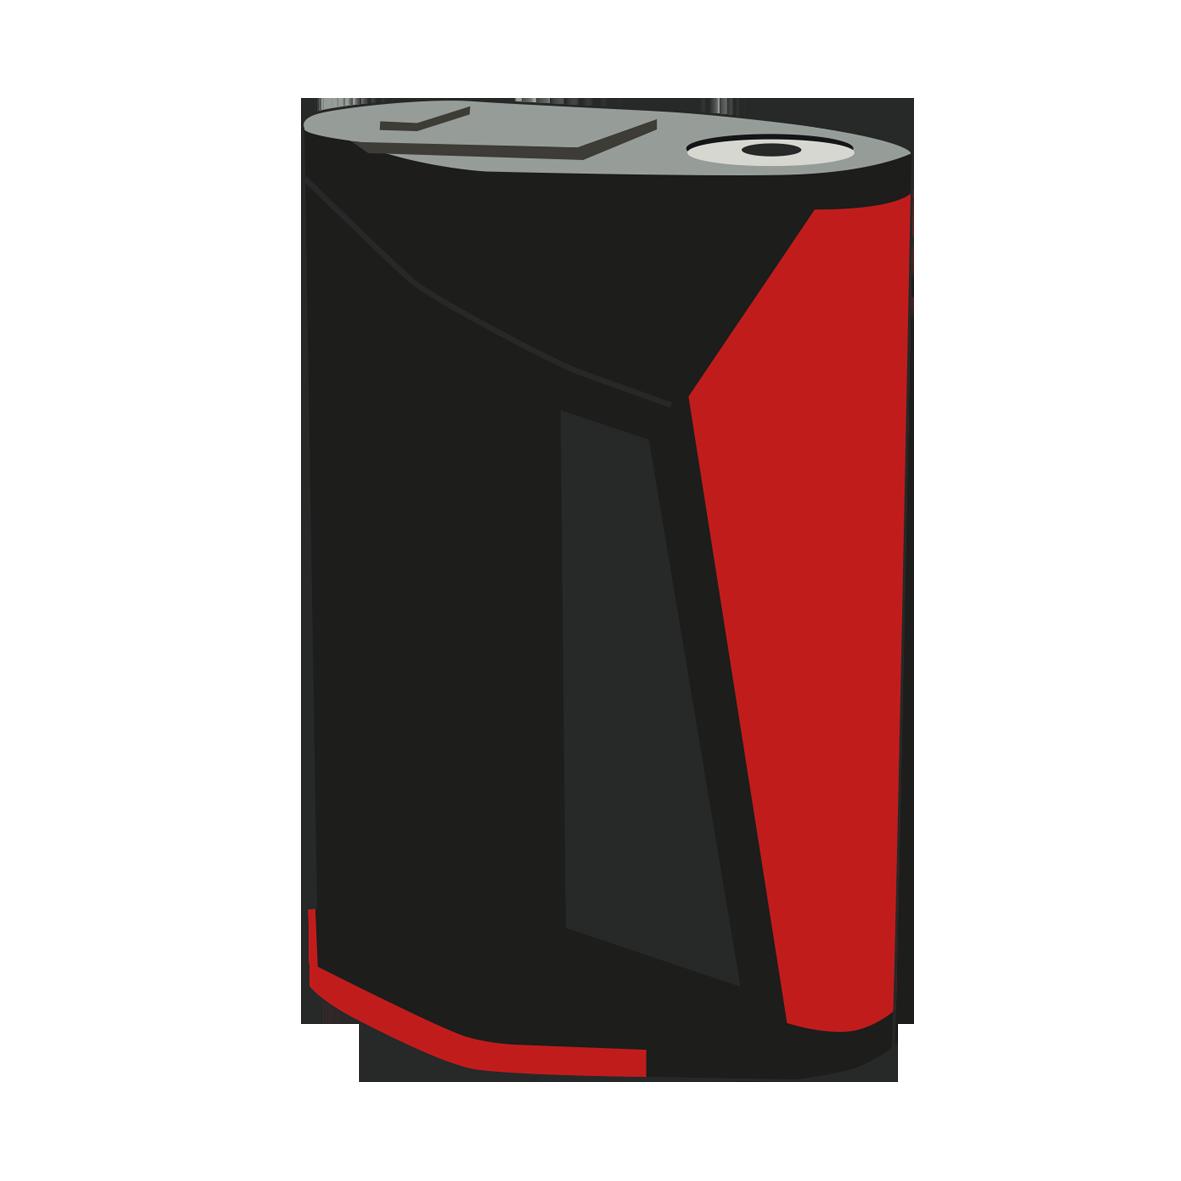 Mod mit 4 Batterien